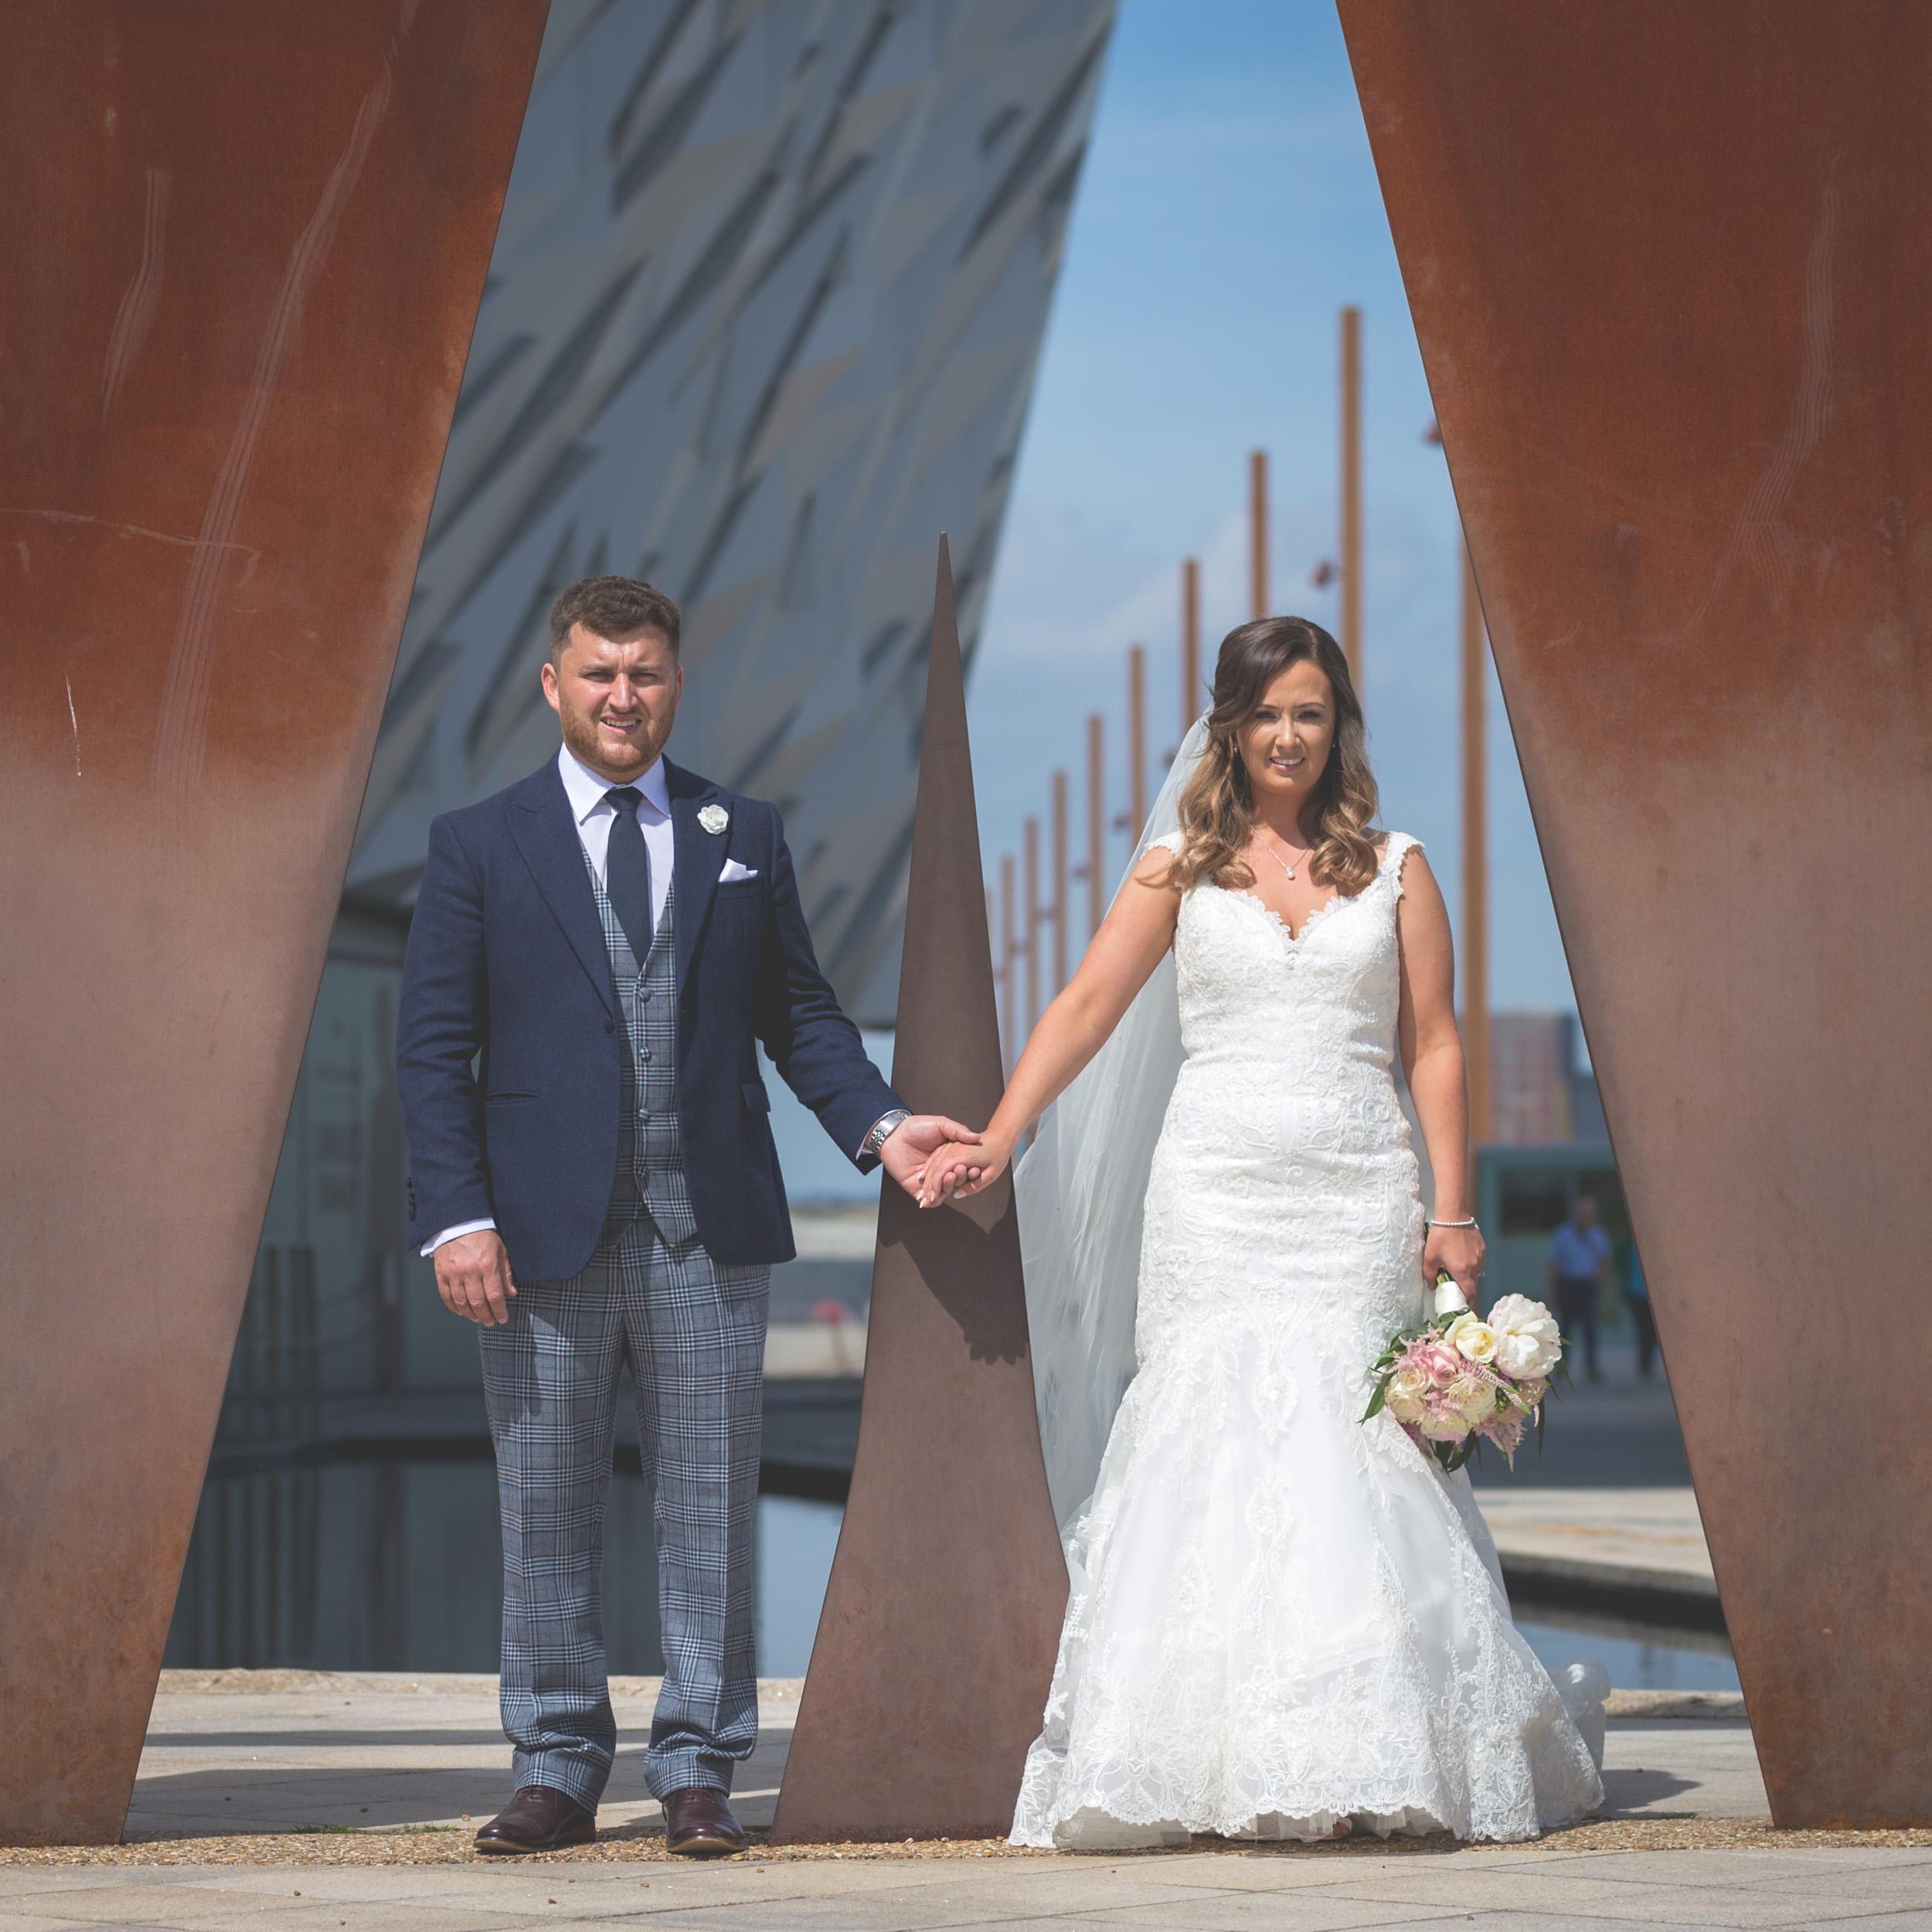 Brian McEwan   Northern Ireland Wedding Photographer   Rebecca & Michael   Portraits-75.jpg